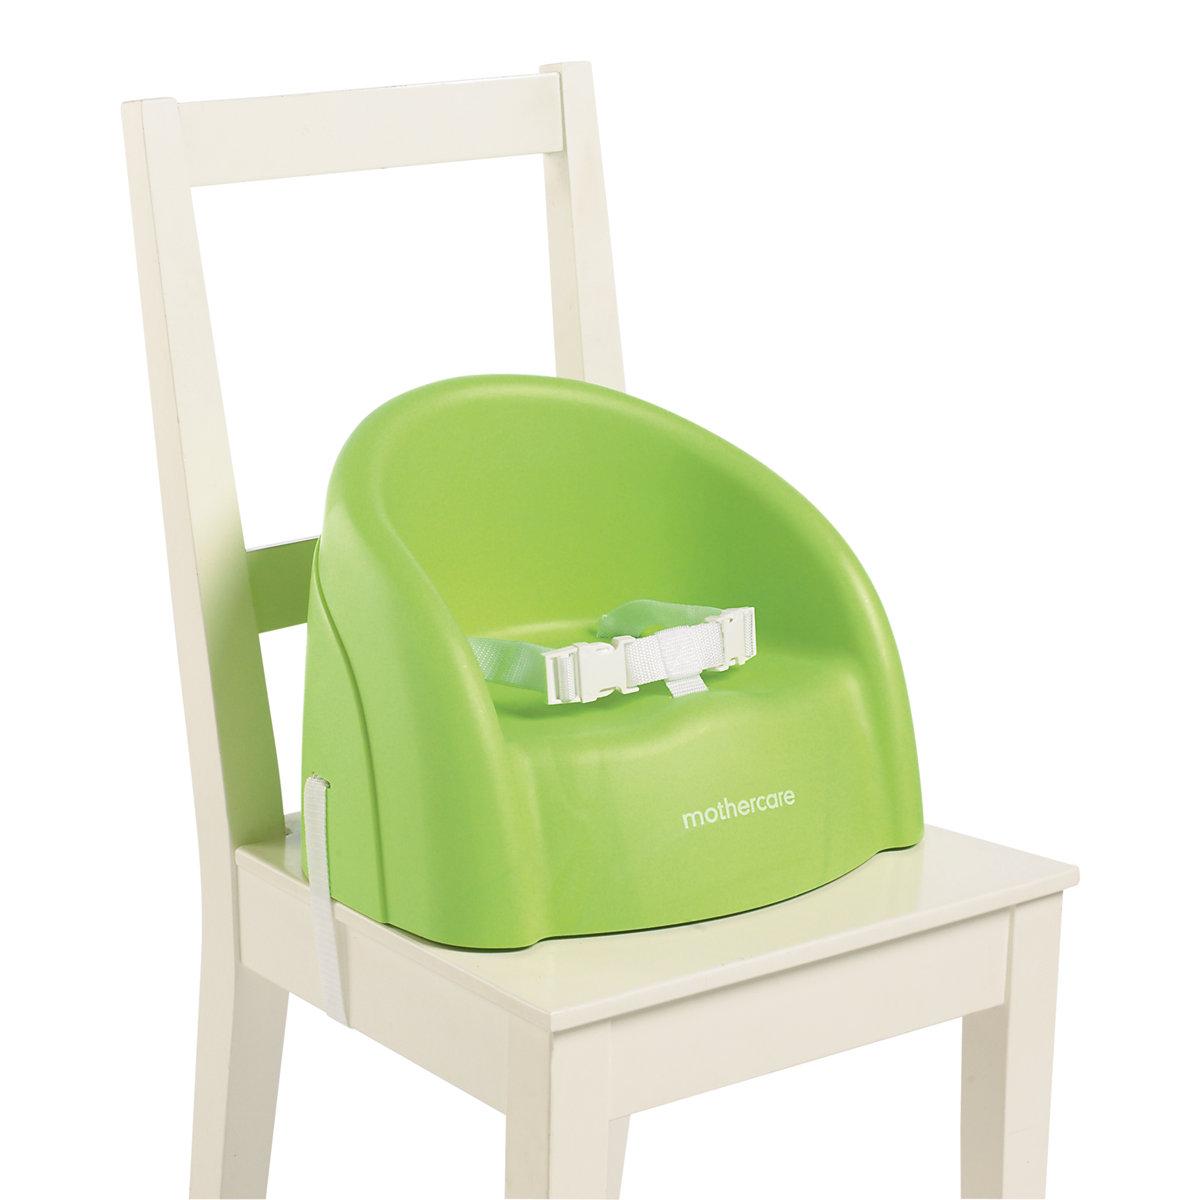 Mothercare Advance Sp Car Seat